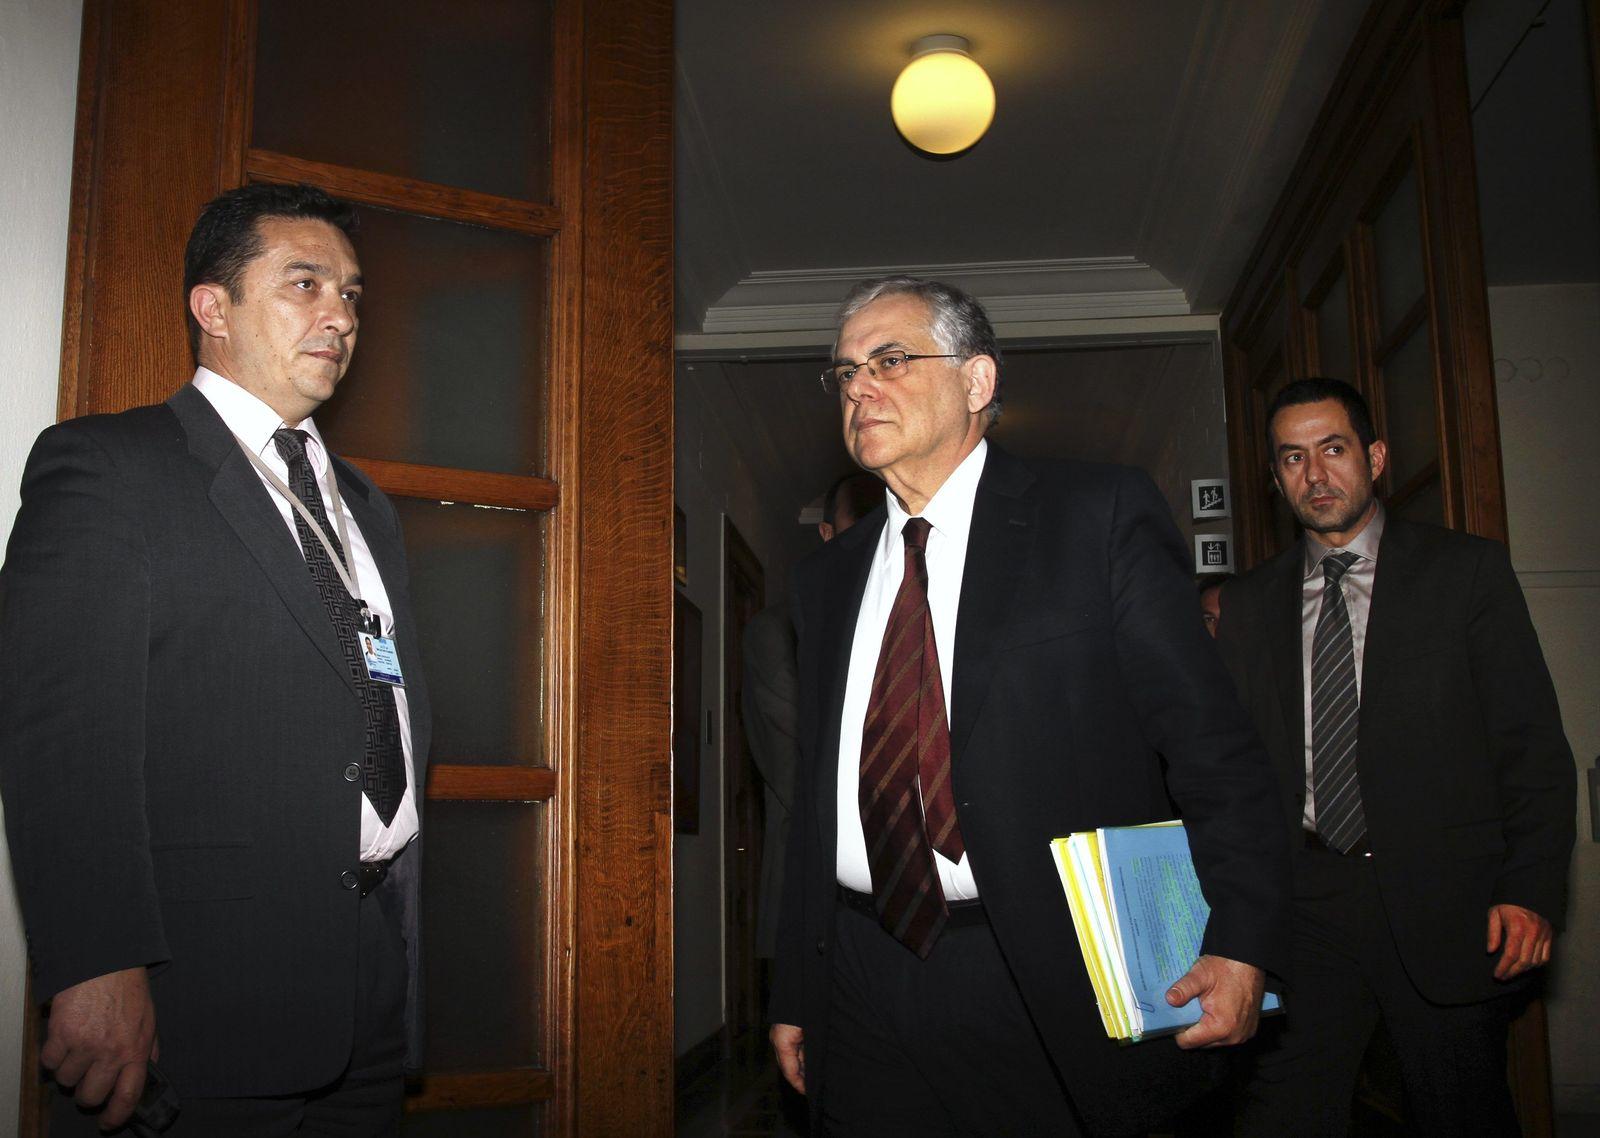 GREECE-PM Papademos Griechenland Krise